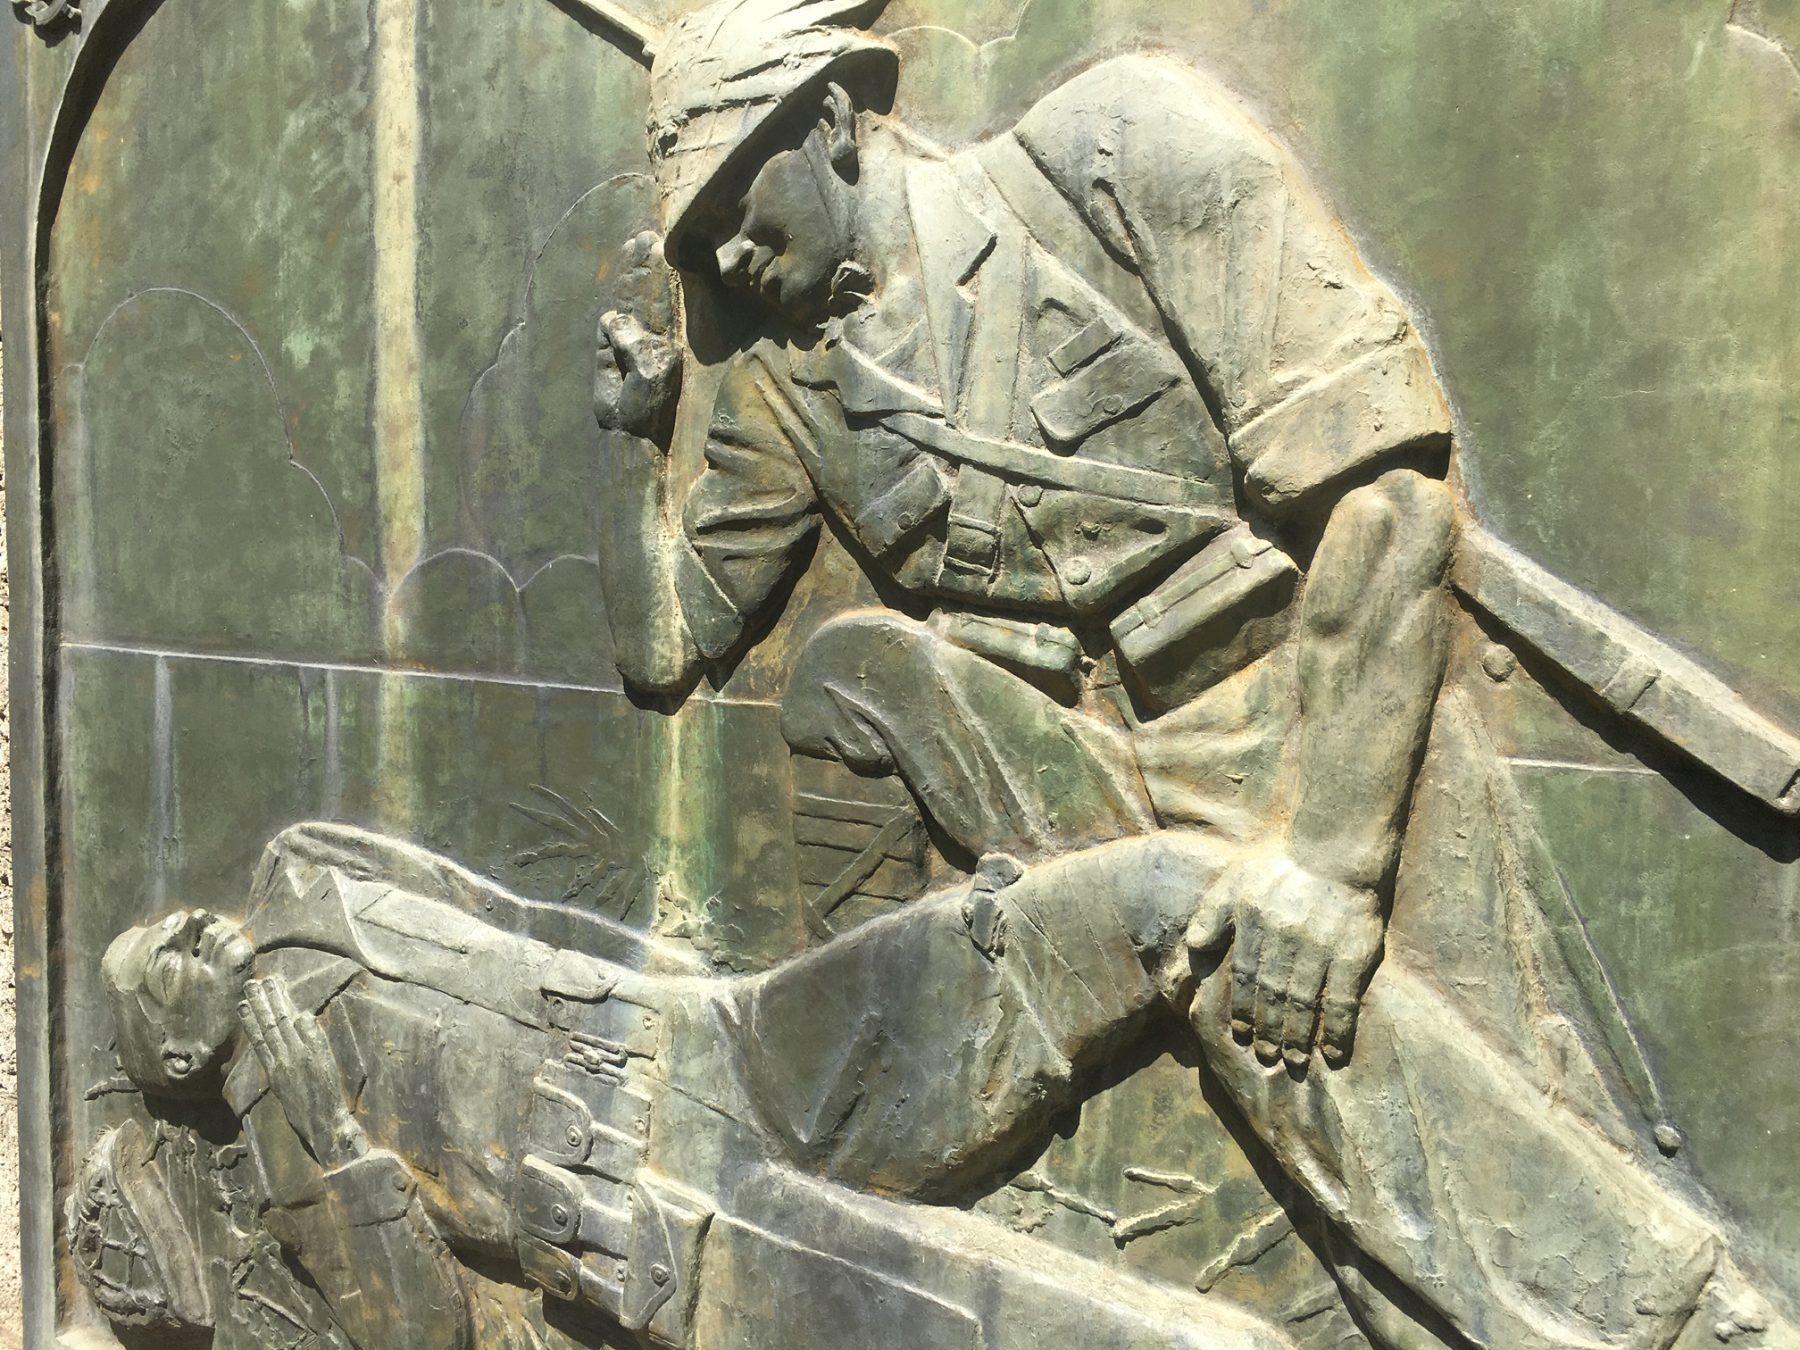 IMG_8158 Boy Scout memorial